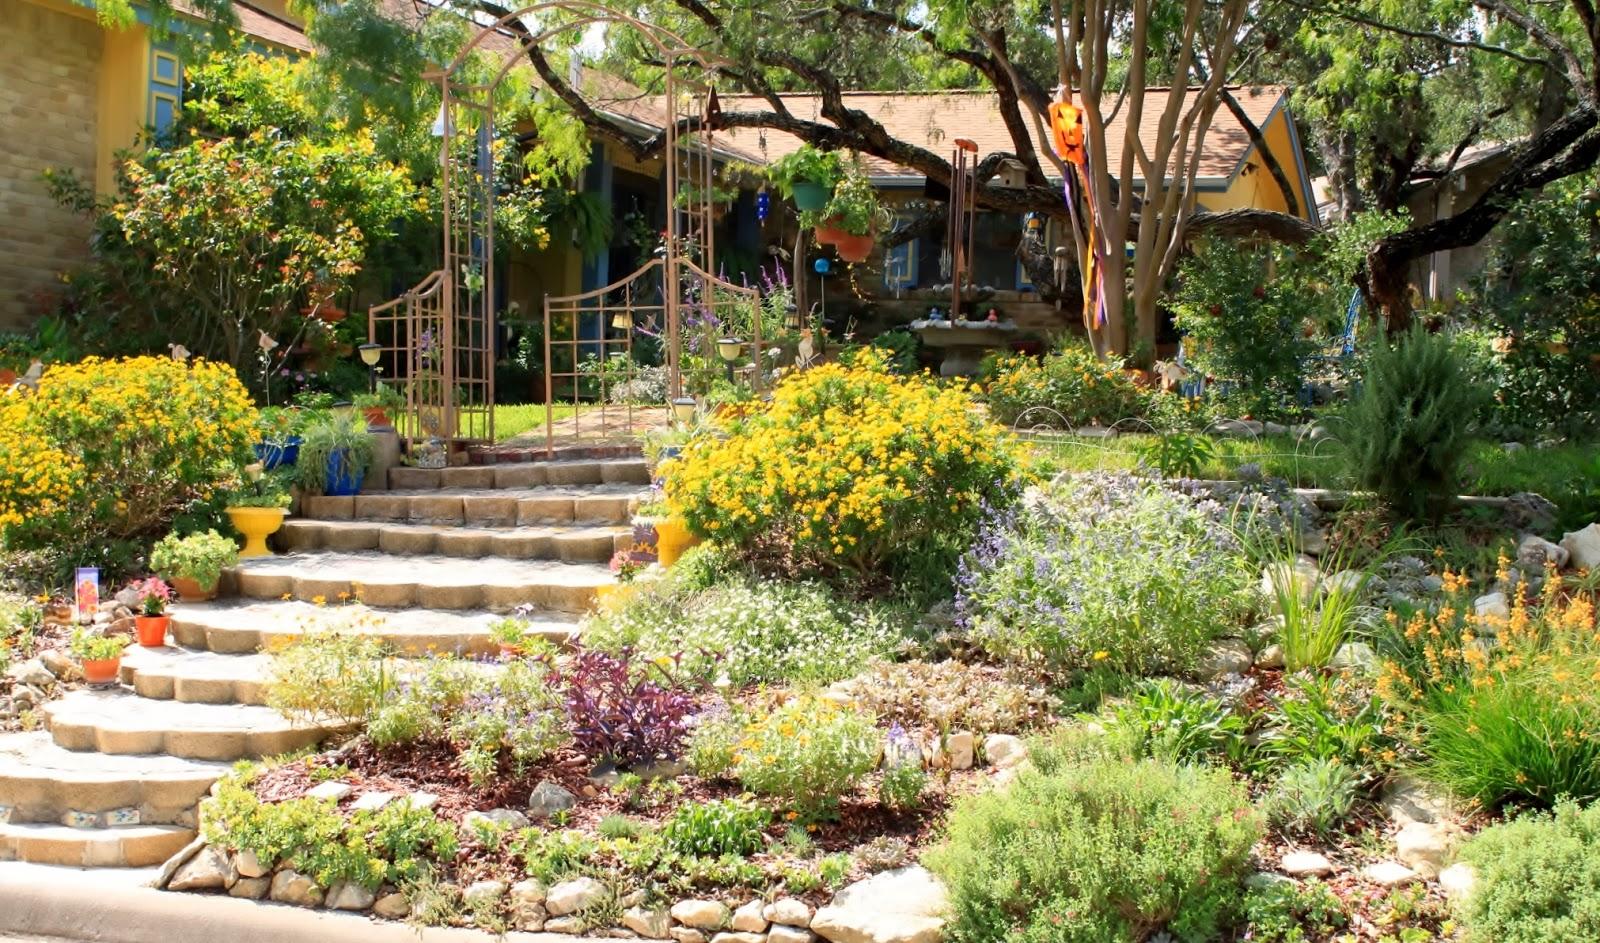 RockOakDeer San Antonio Watersaver Landscape Tour Garden on